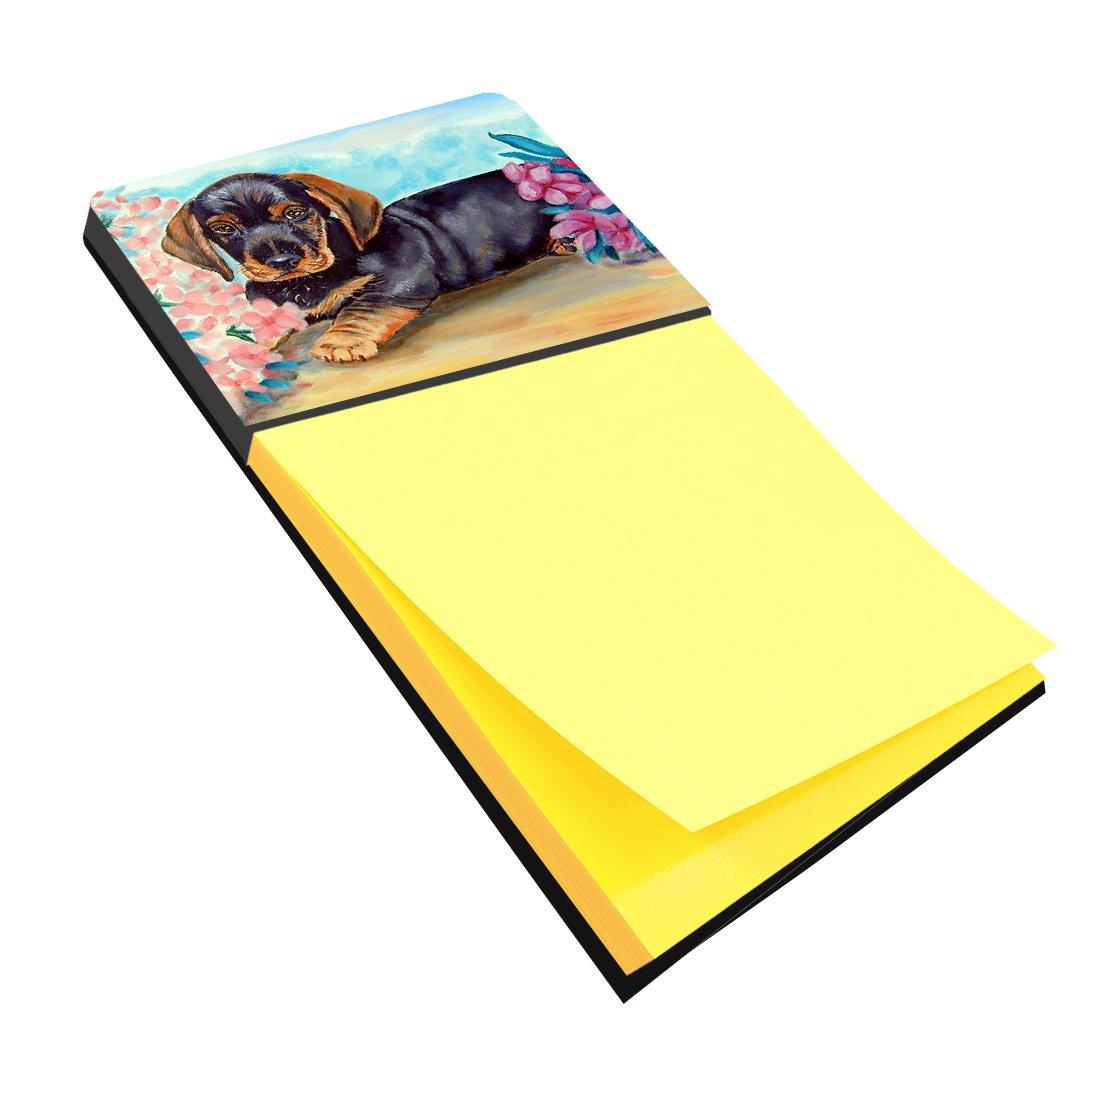 Caroline's Treasures 7501SN Dachshund Refiillable Sticky Note Holder or Postit Note Dispenser, Large, Multicolor